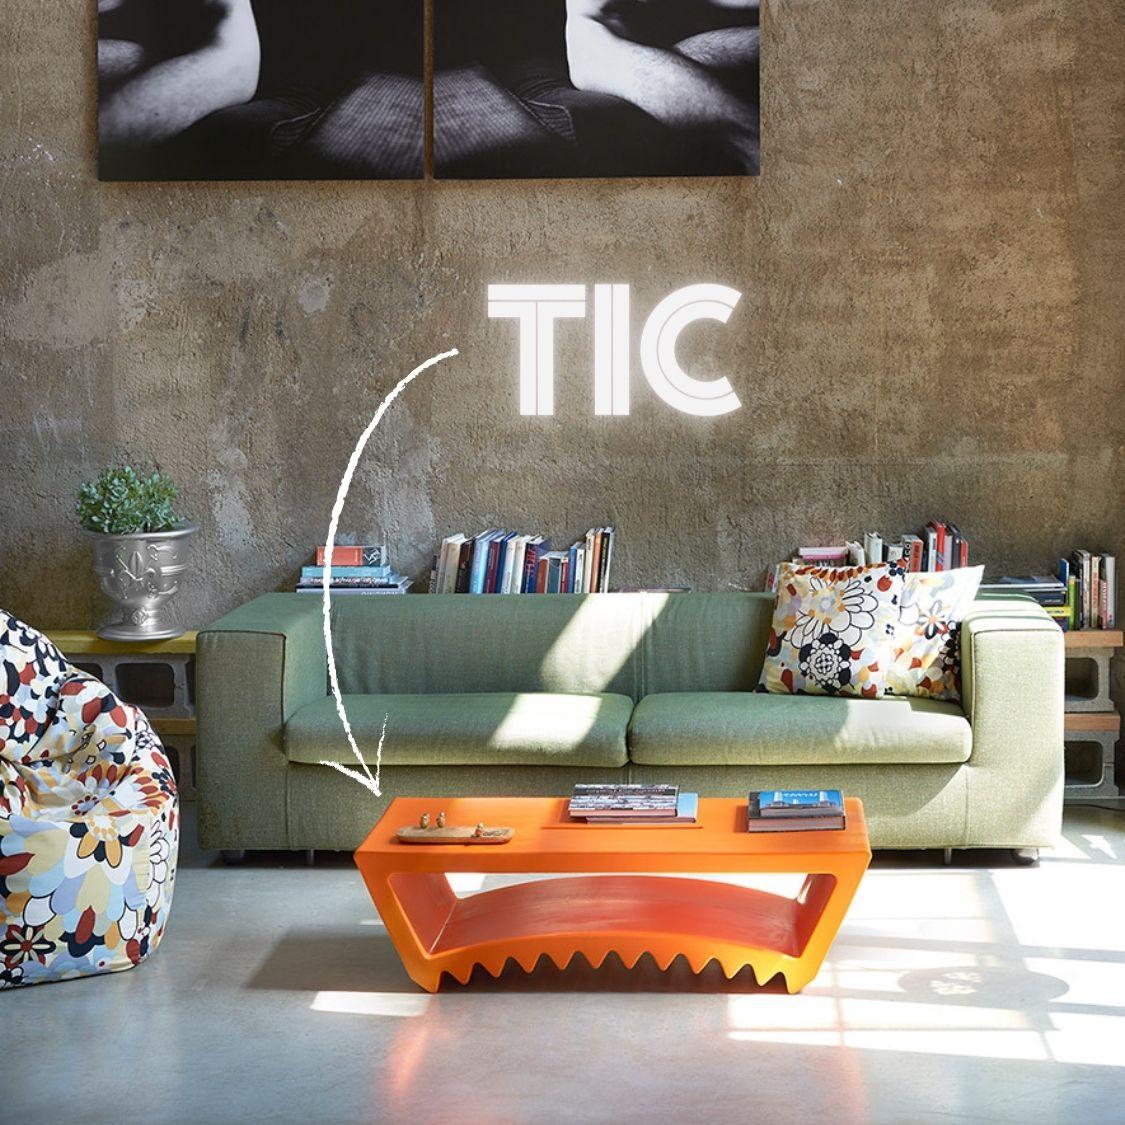 tic-table-slide design